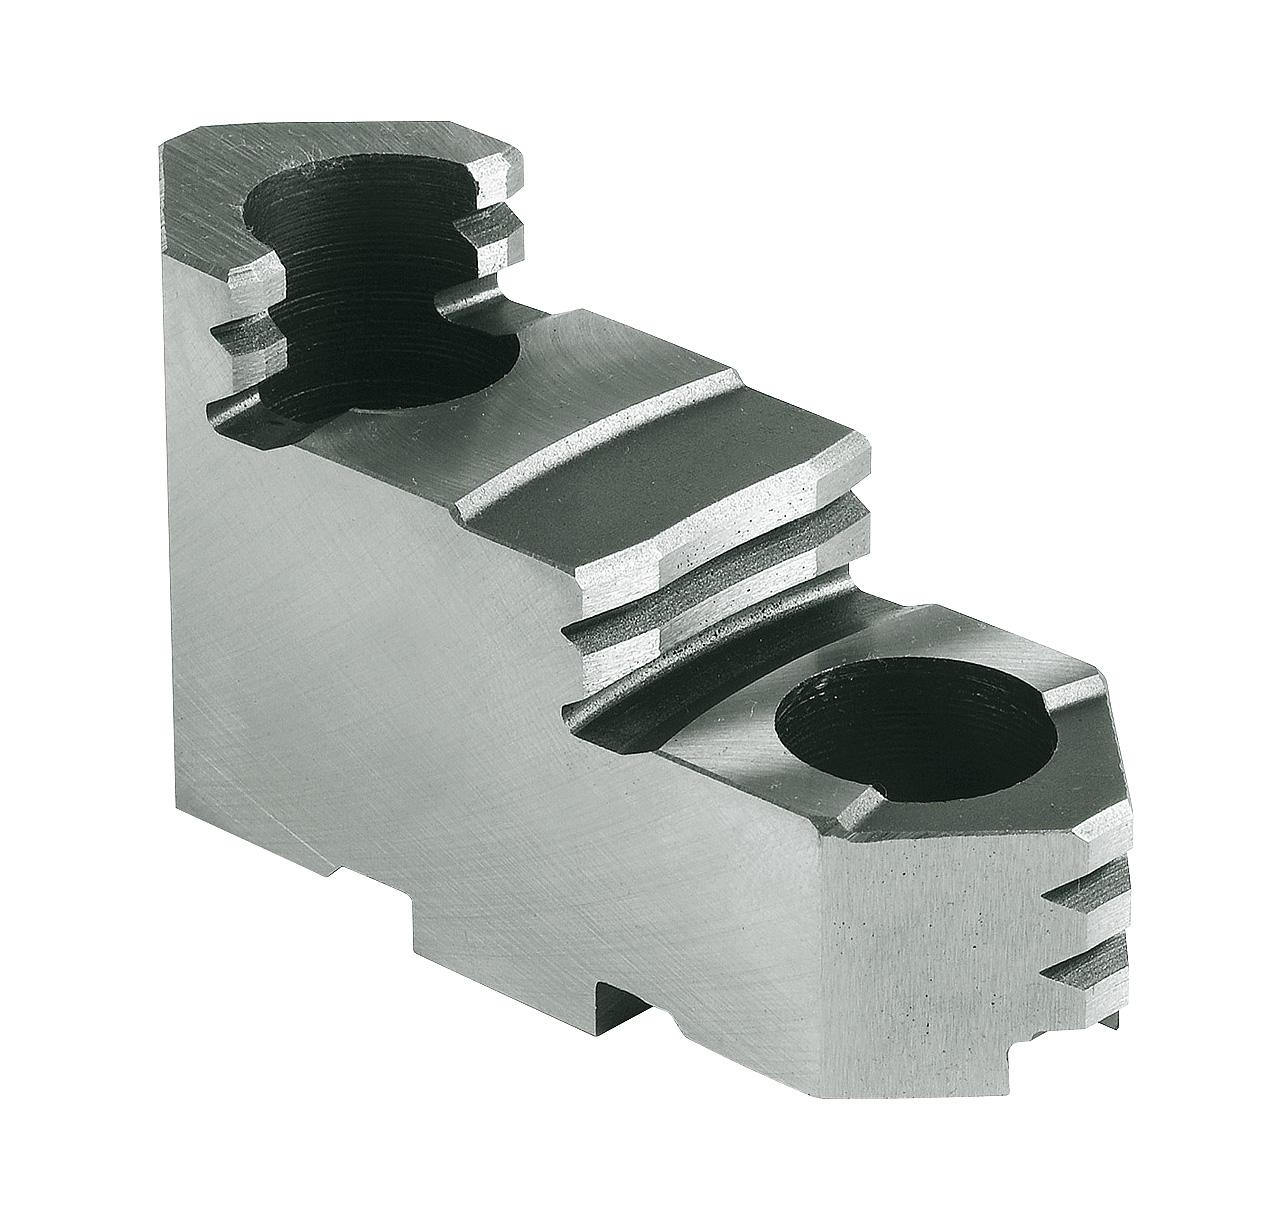 Szczęki górne twarde - komplet DTJ-DK12-400 BERNARDO